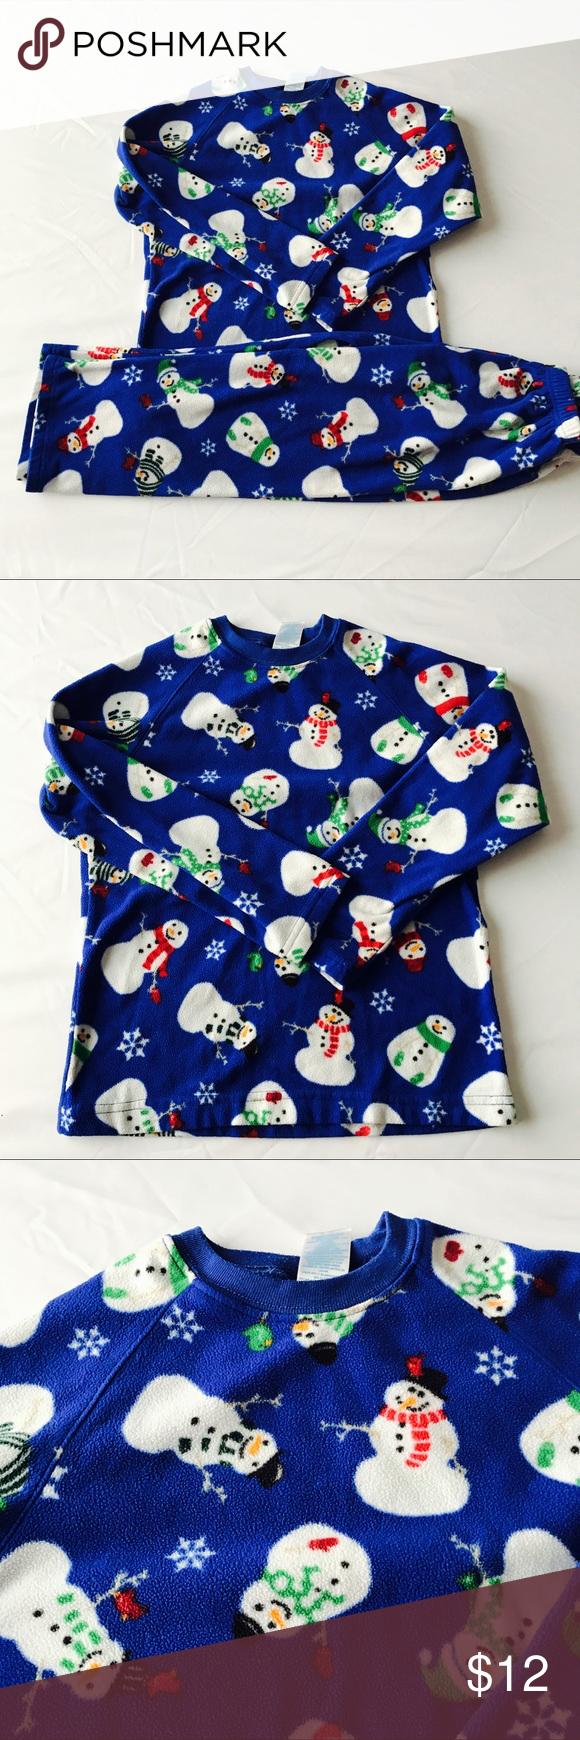 blue boys christmas holiday winter snowman pajamas childrens place blue boys christmas holiday winter snowman pajamas excellent condition no flaws